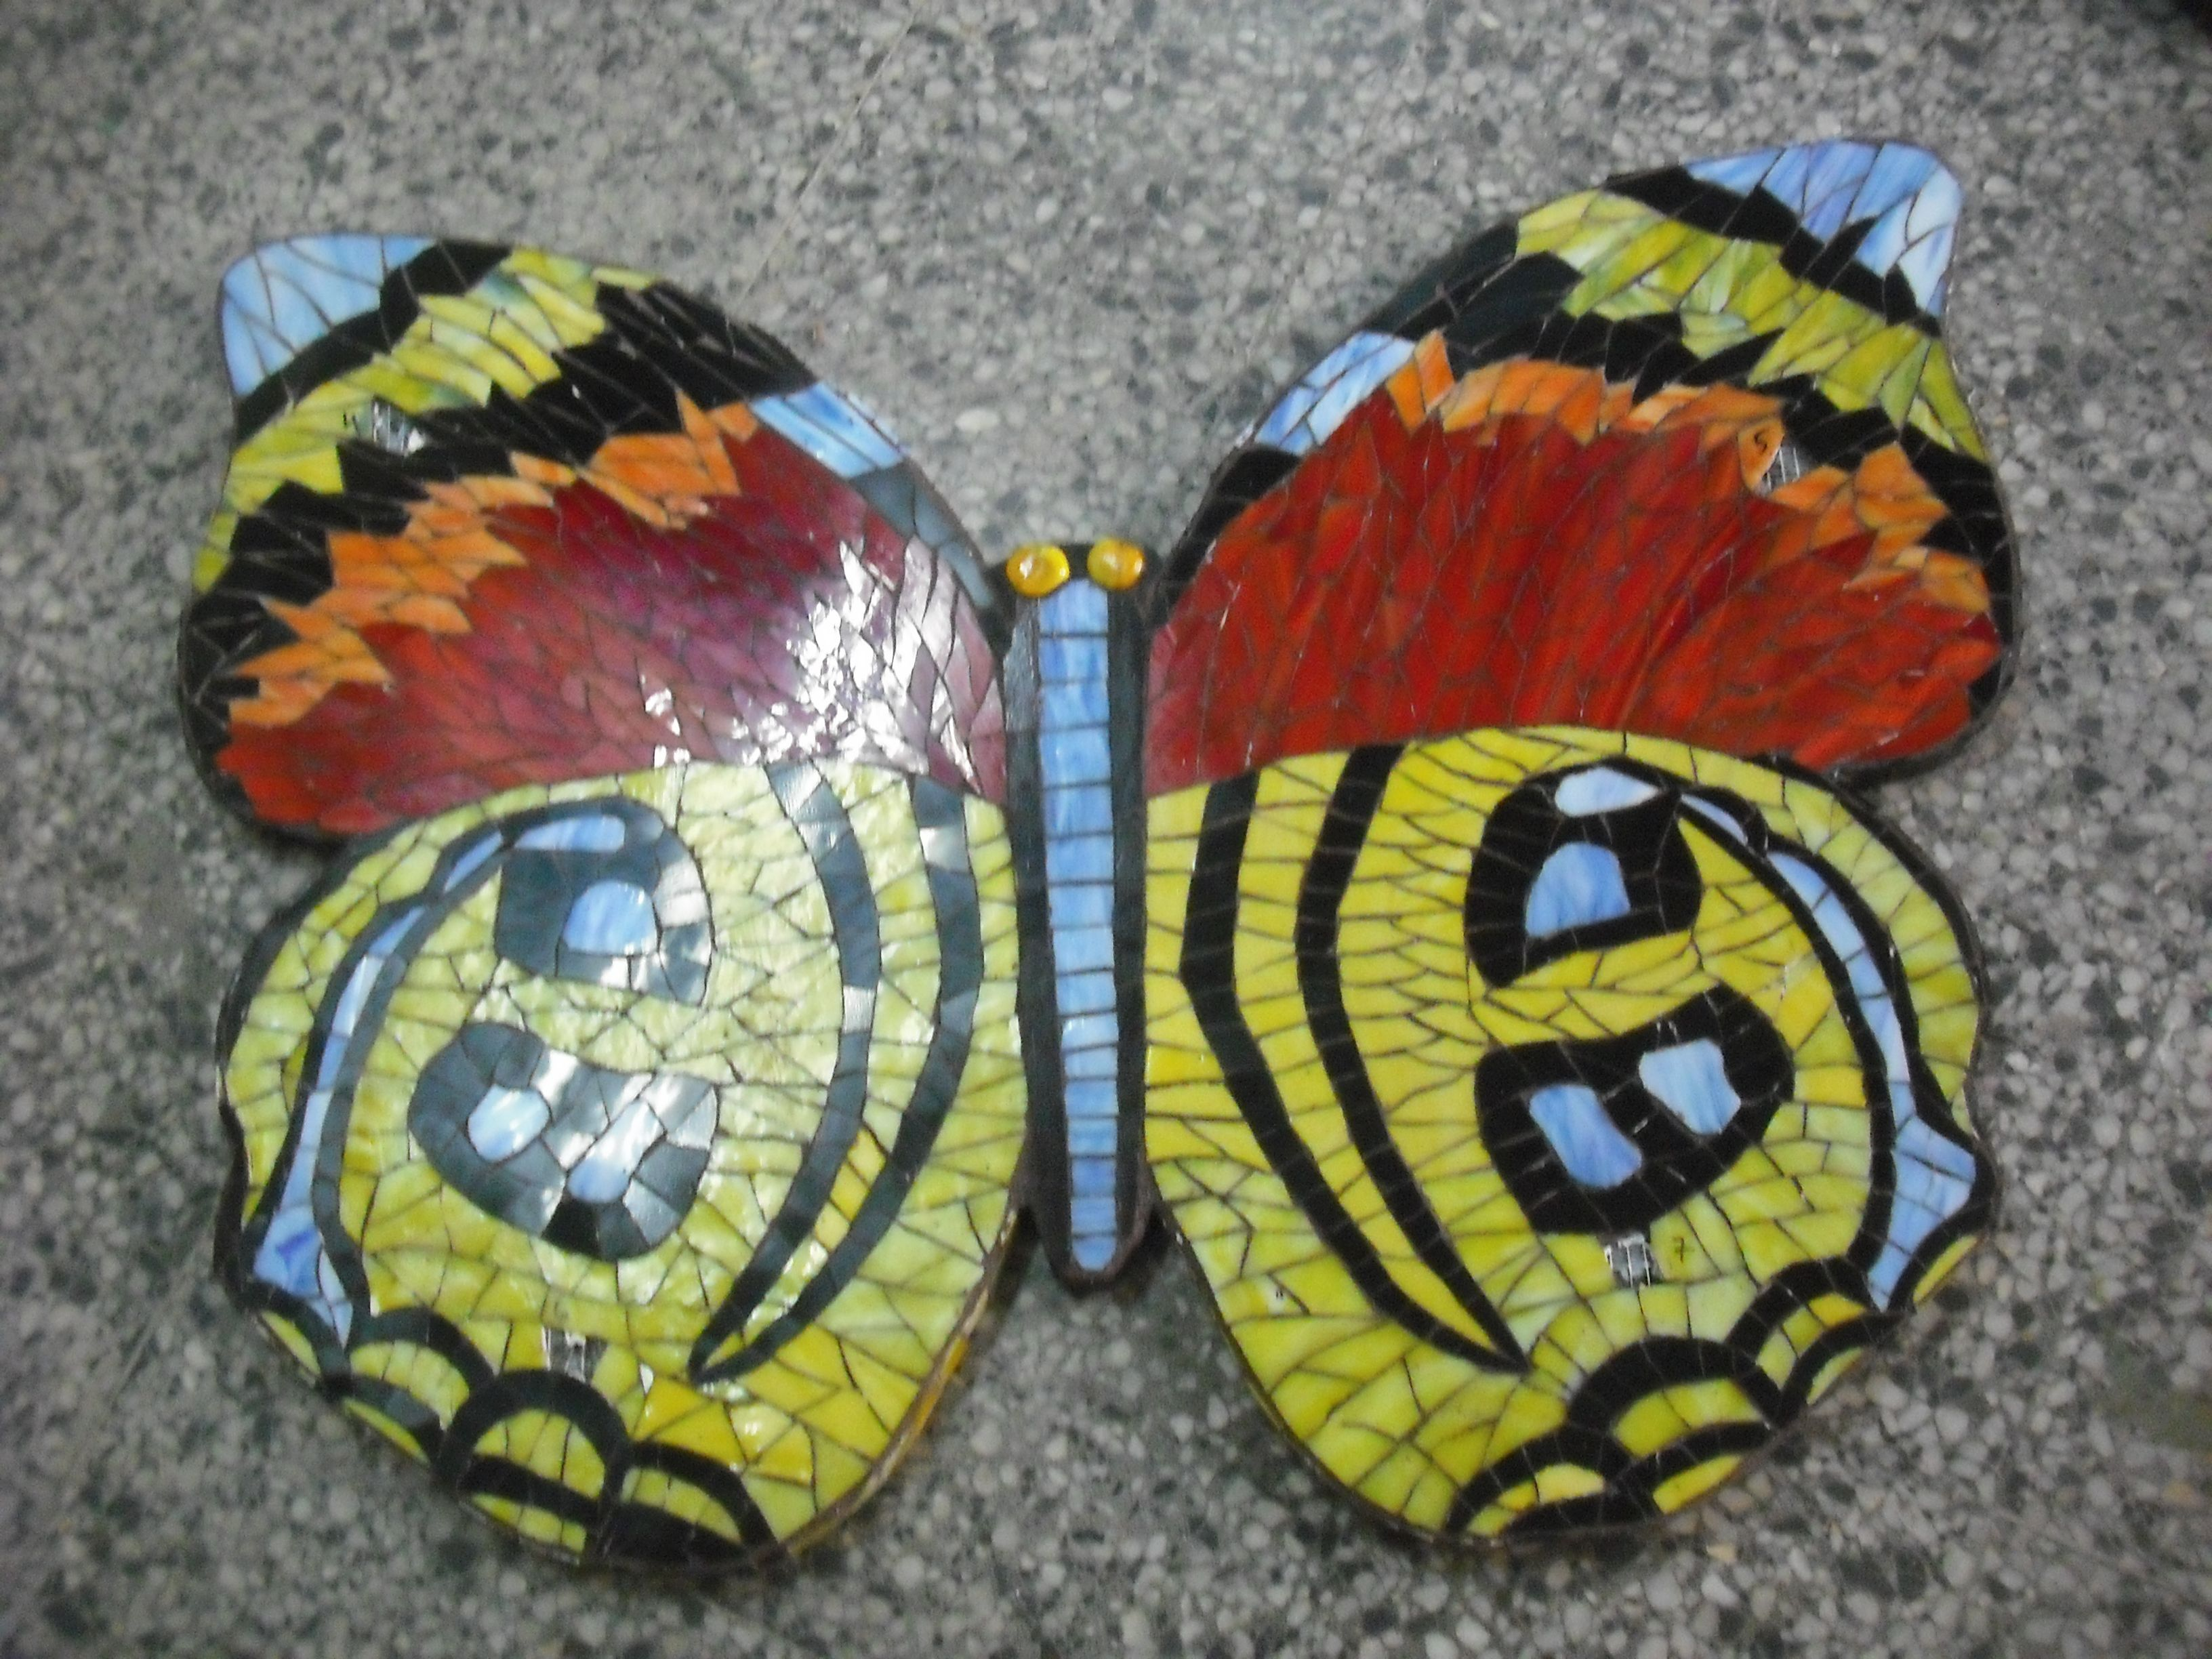 mariposa de mosaico de vidrio con volumen butterfly glass mosaic 3-D